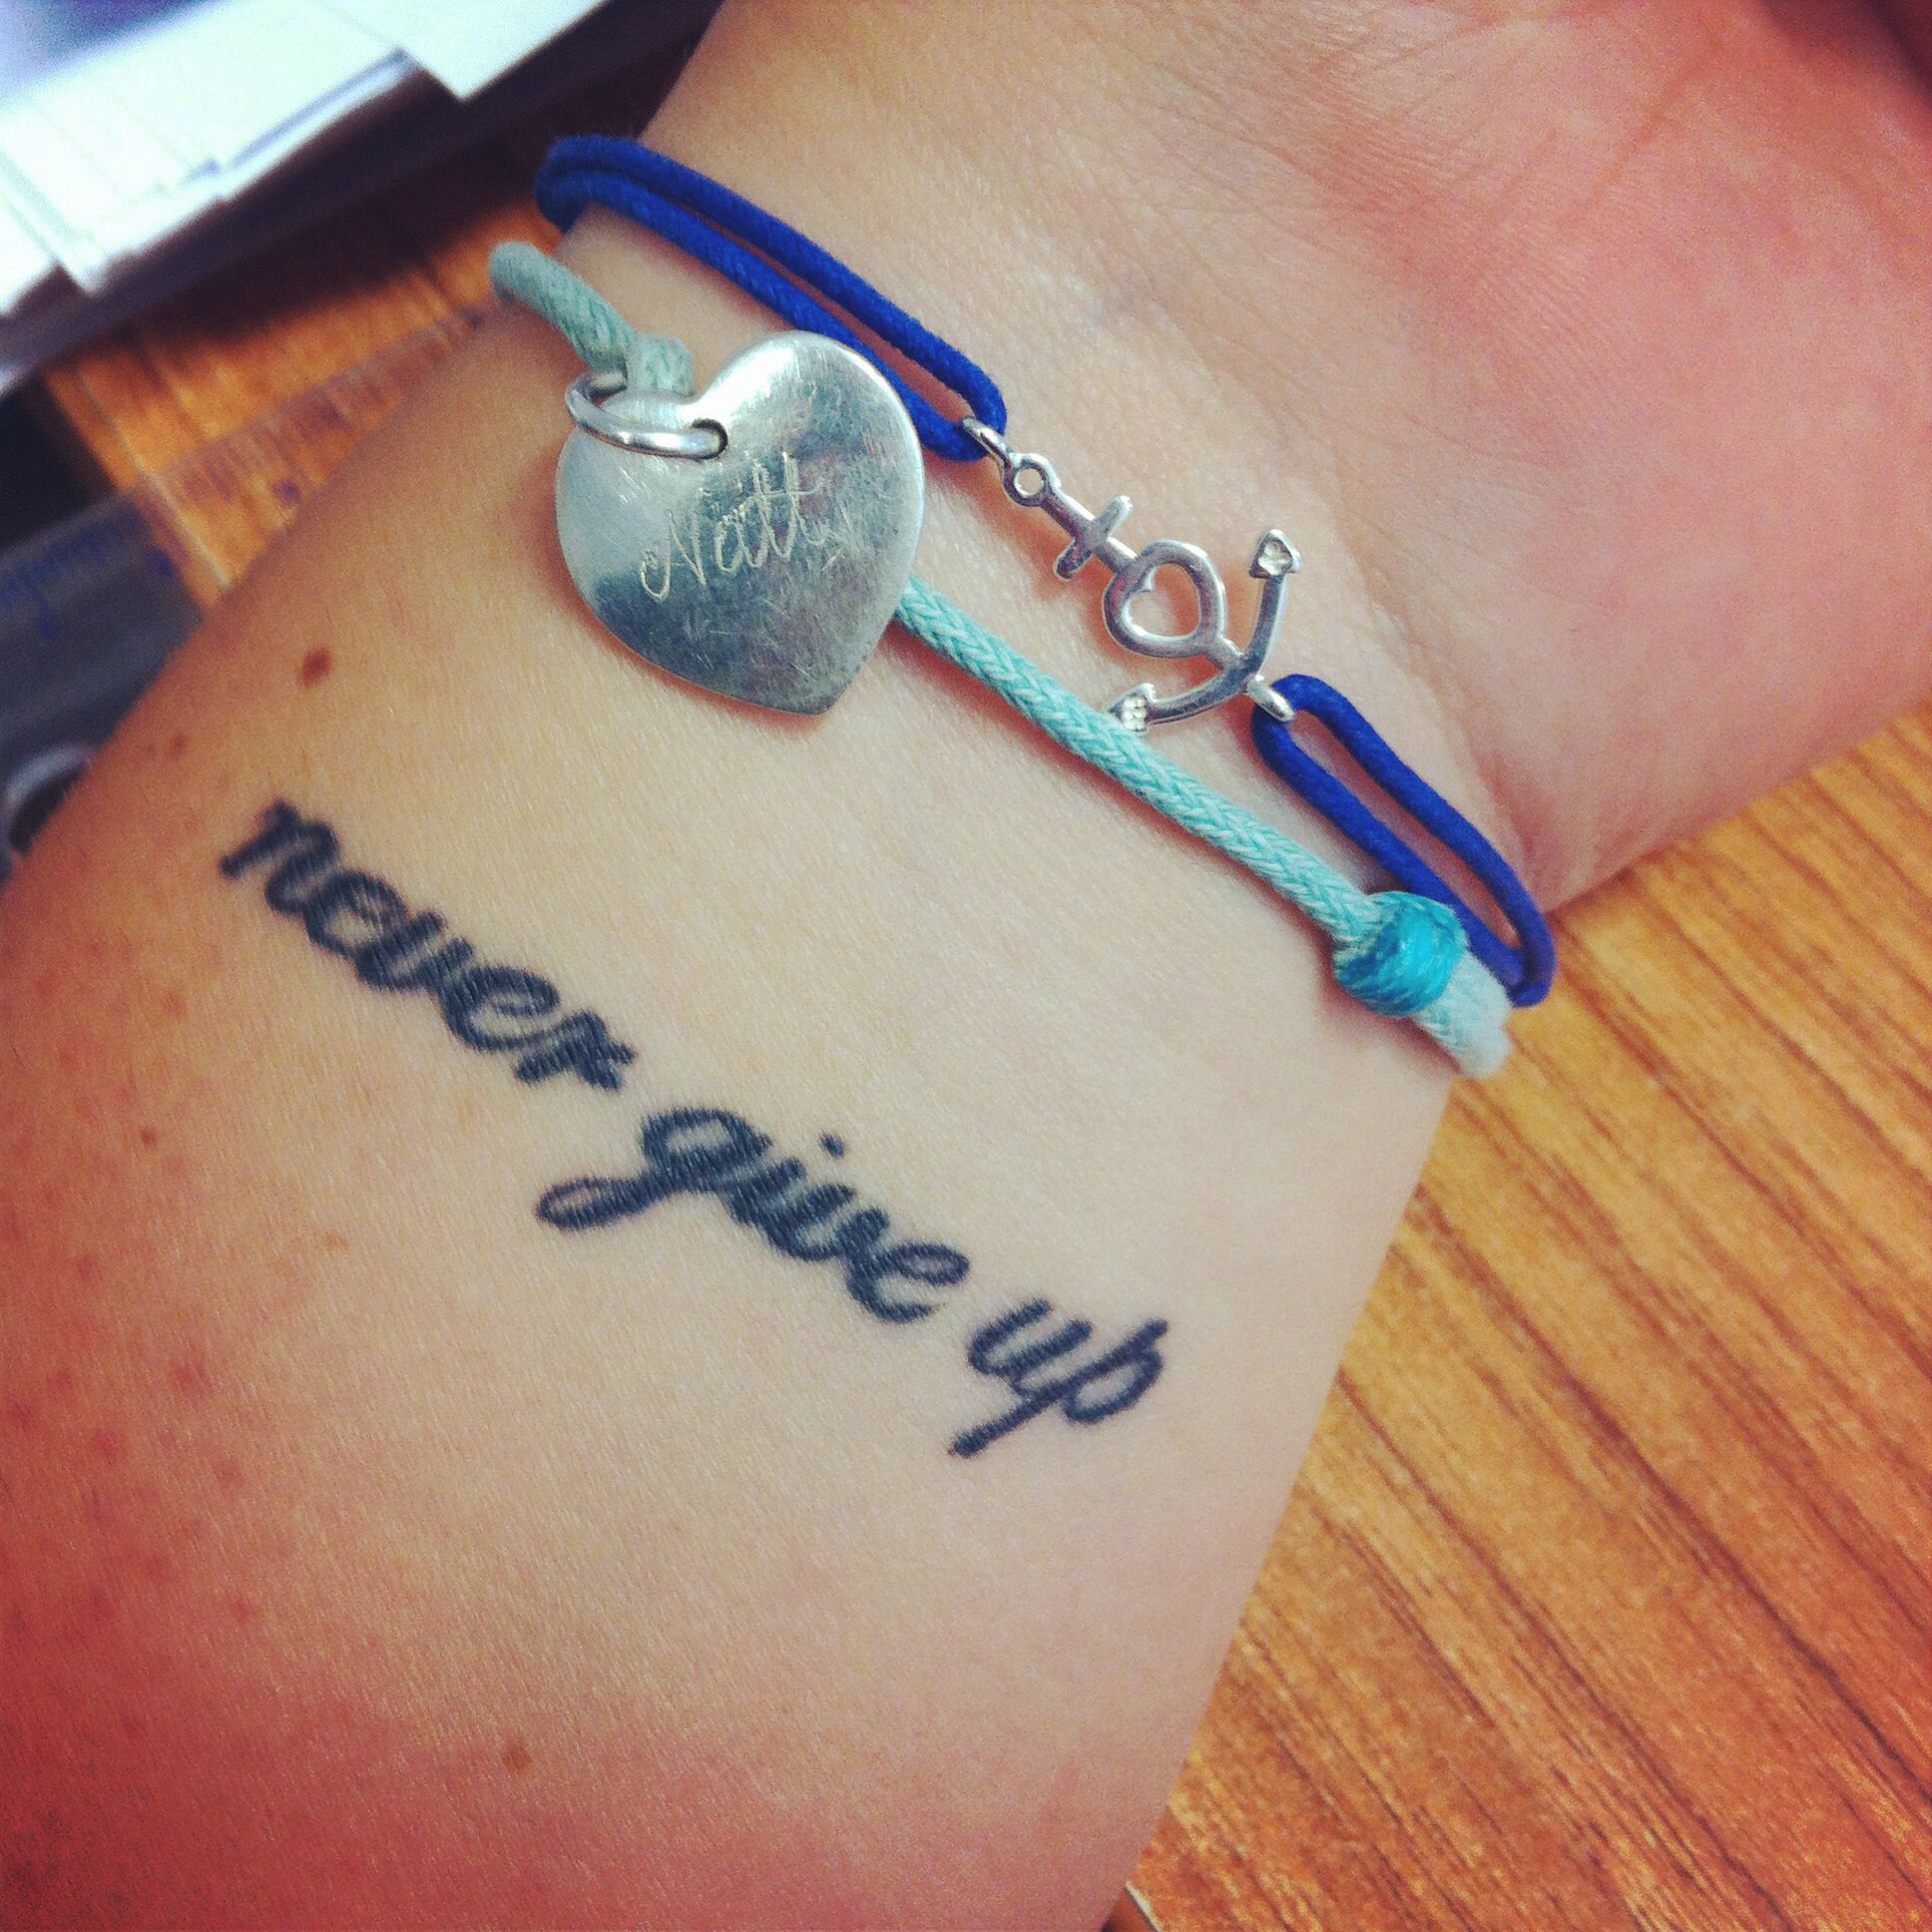 Never Give Up Tatuaż Lilou Inspiration Ciekawostki